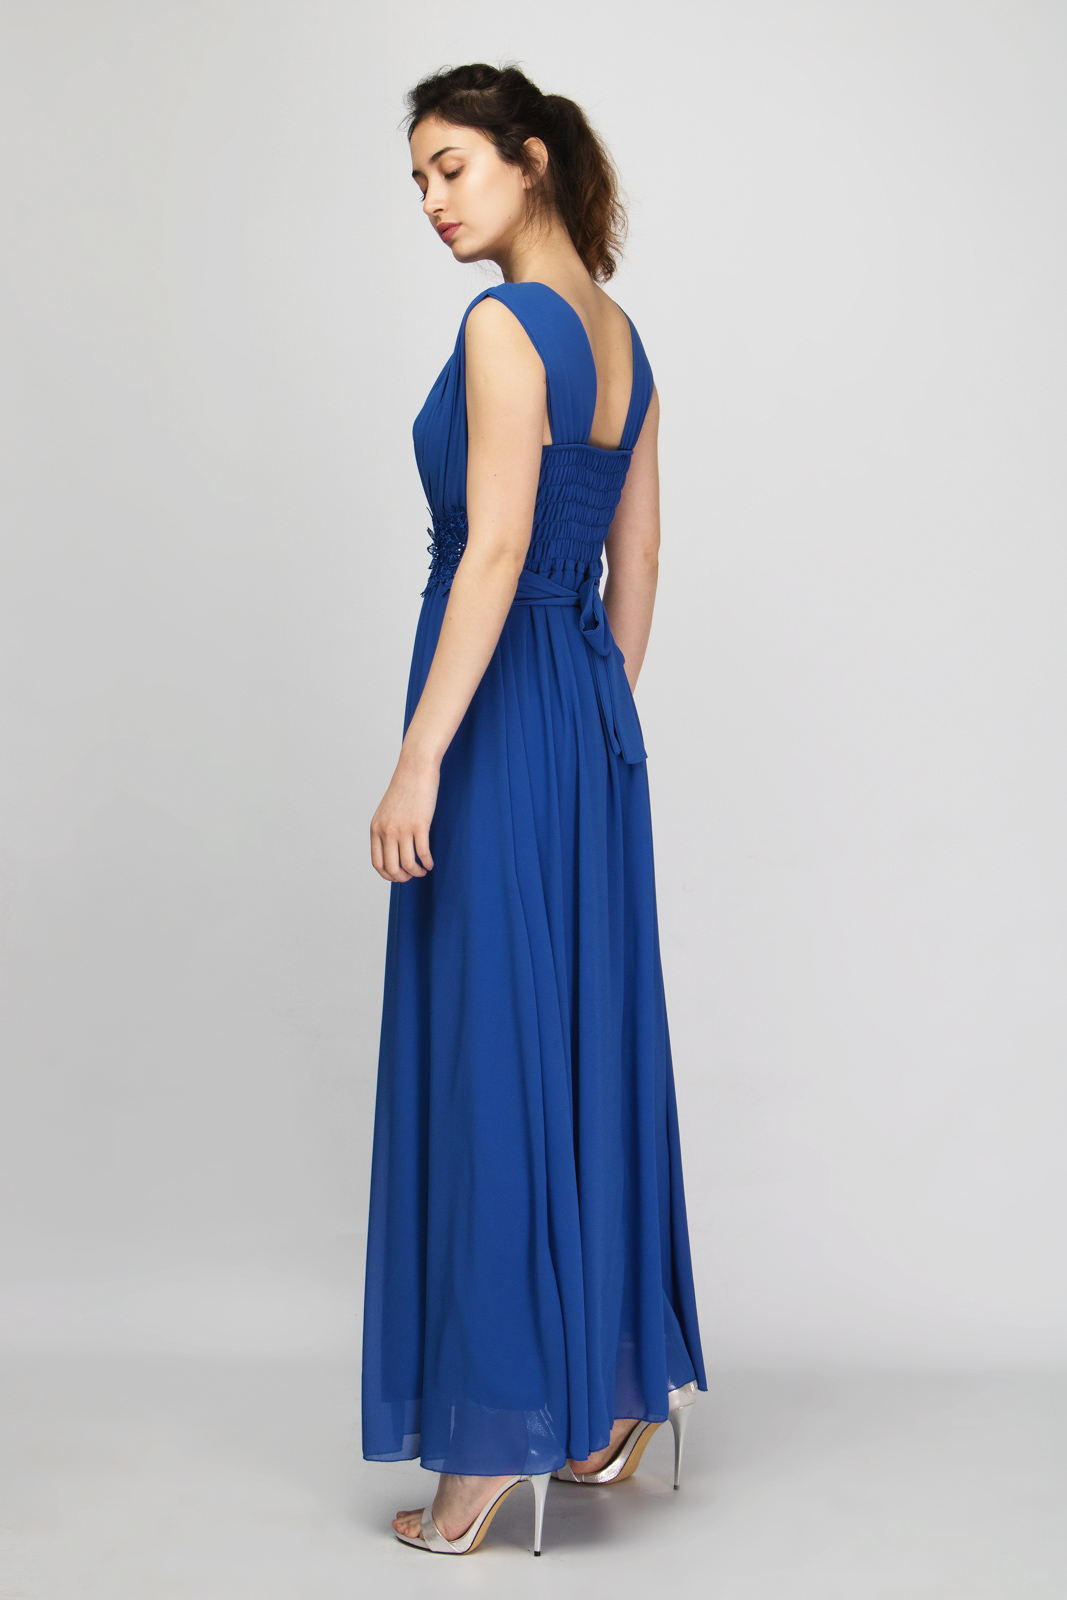 ccbc8d320b5b Μάξι Αμάνικο Φόρεμα Διακοσμημένο με Δαντέλα